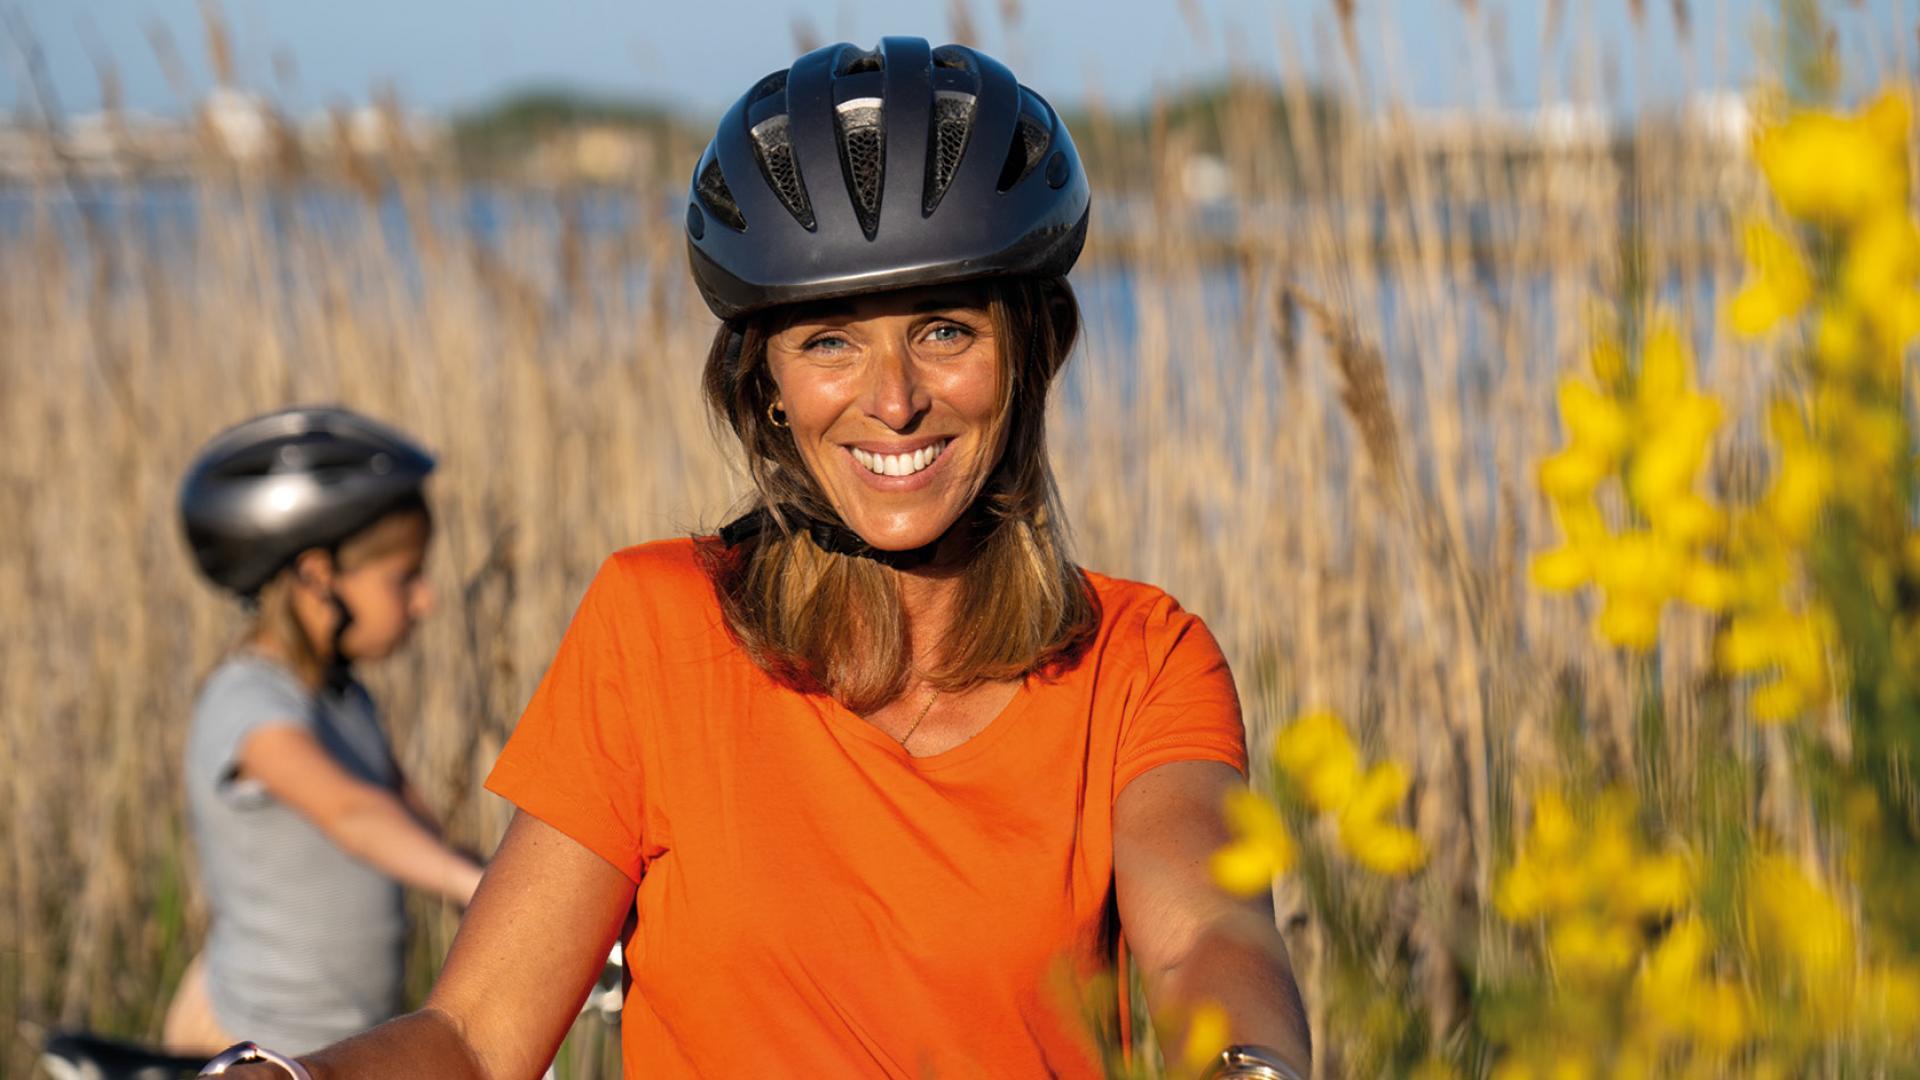 Une guide de vélo souriante